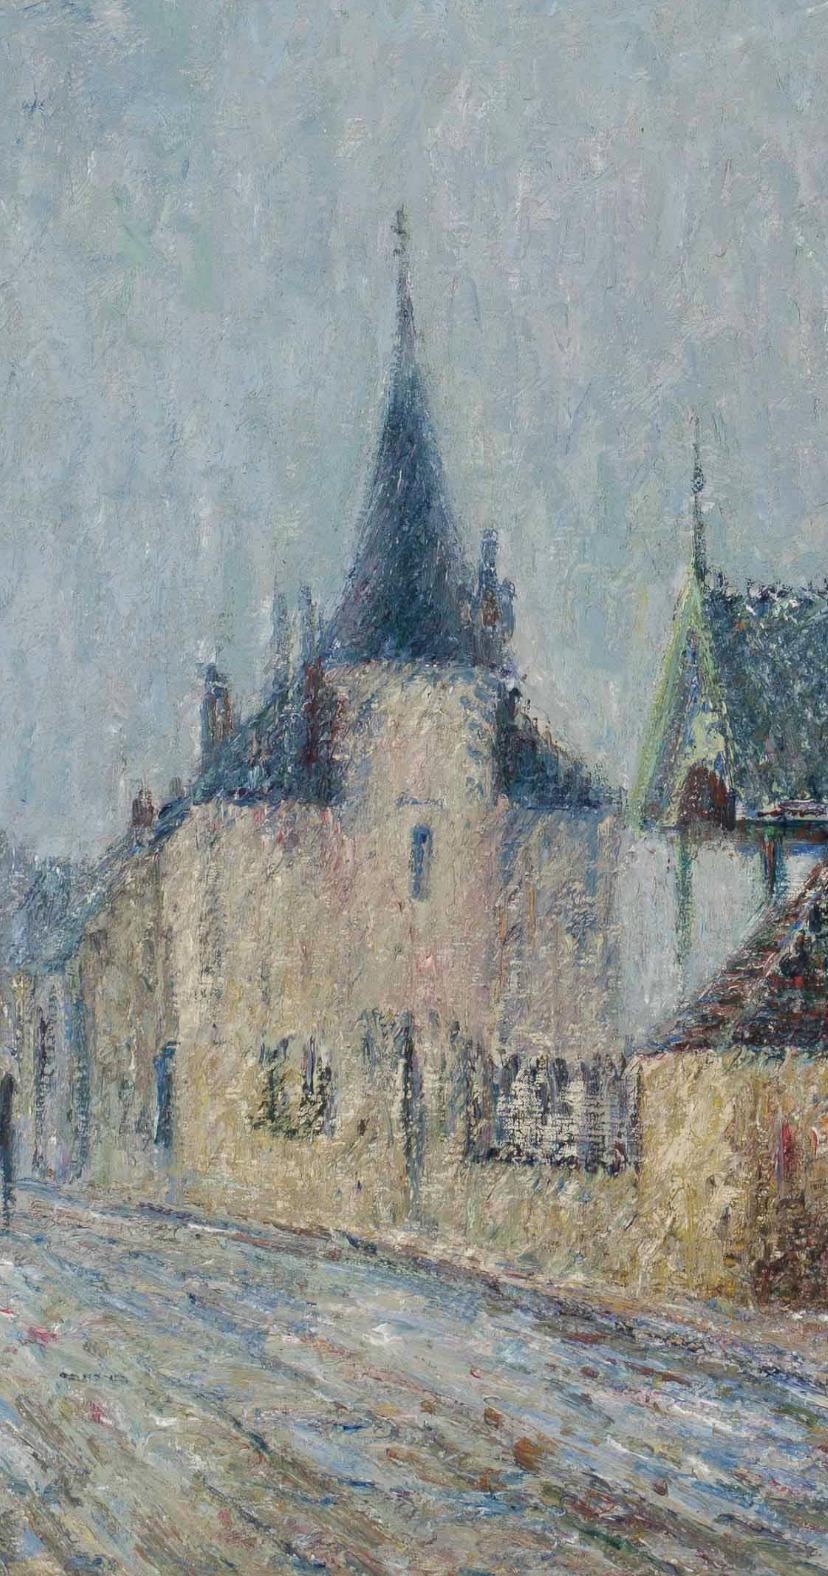 bScreenshot_2018-12-21 2015_NYR_03737_1017_000(gustave_loiseau_le_quai_du_pothuis_a_pontoise) jpg (JPEG Image, 3200 × 2641 p[...]